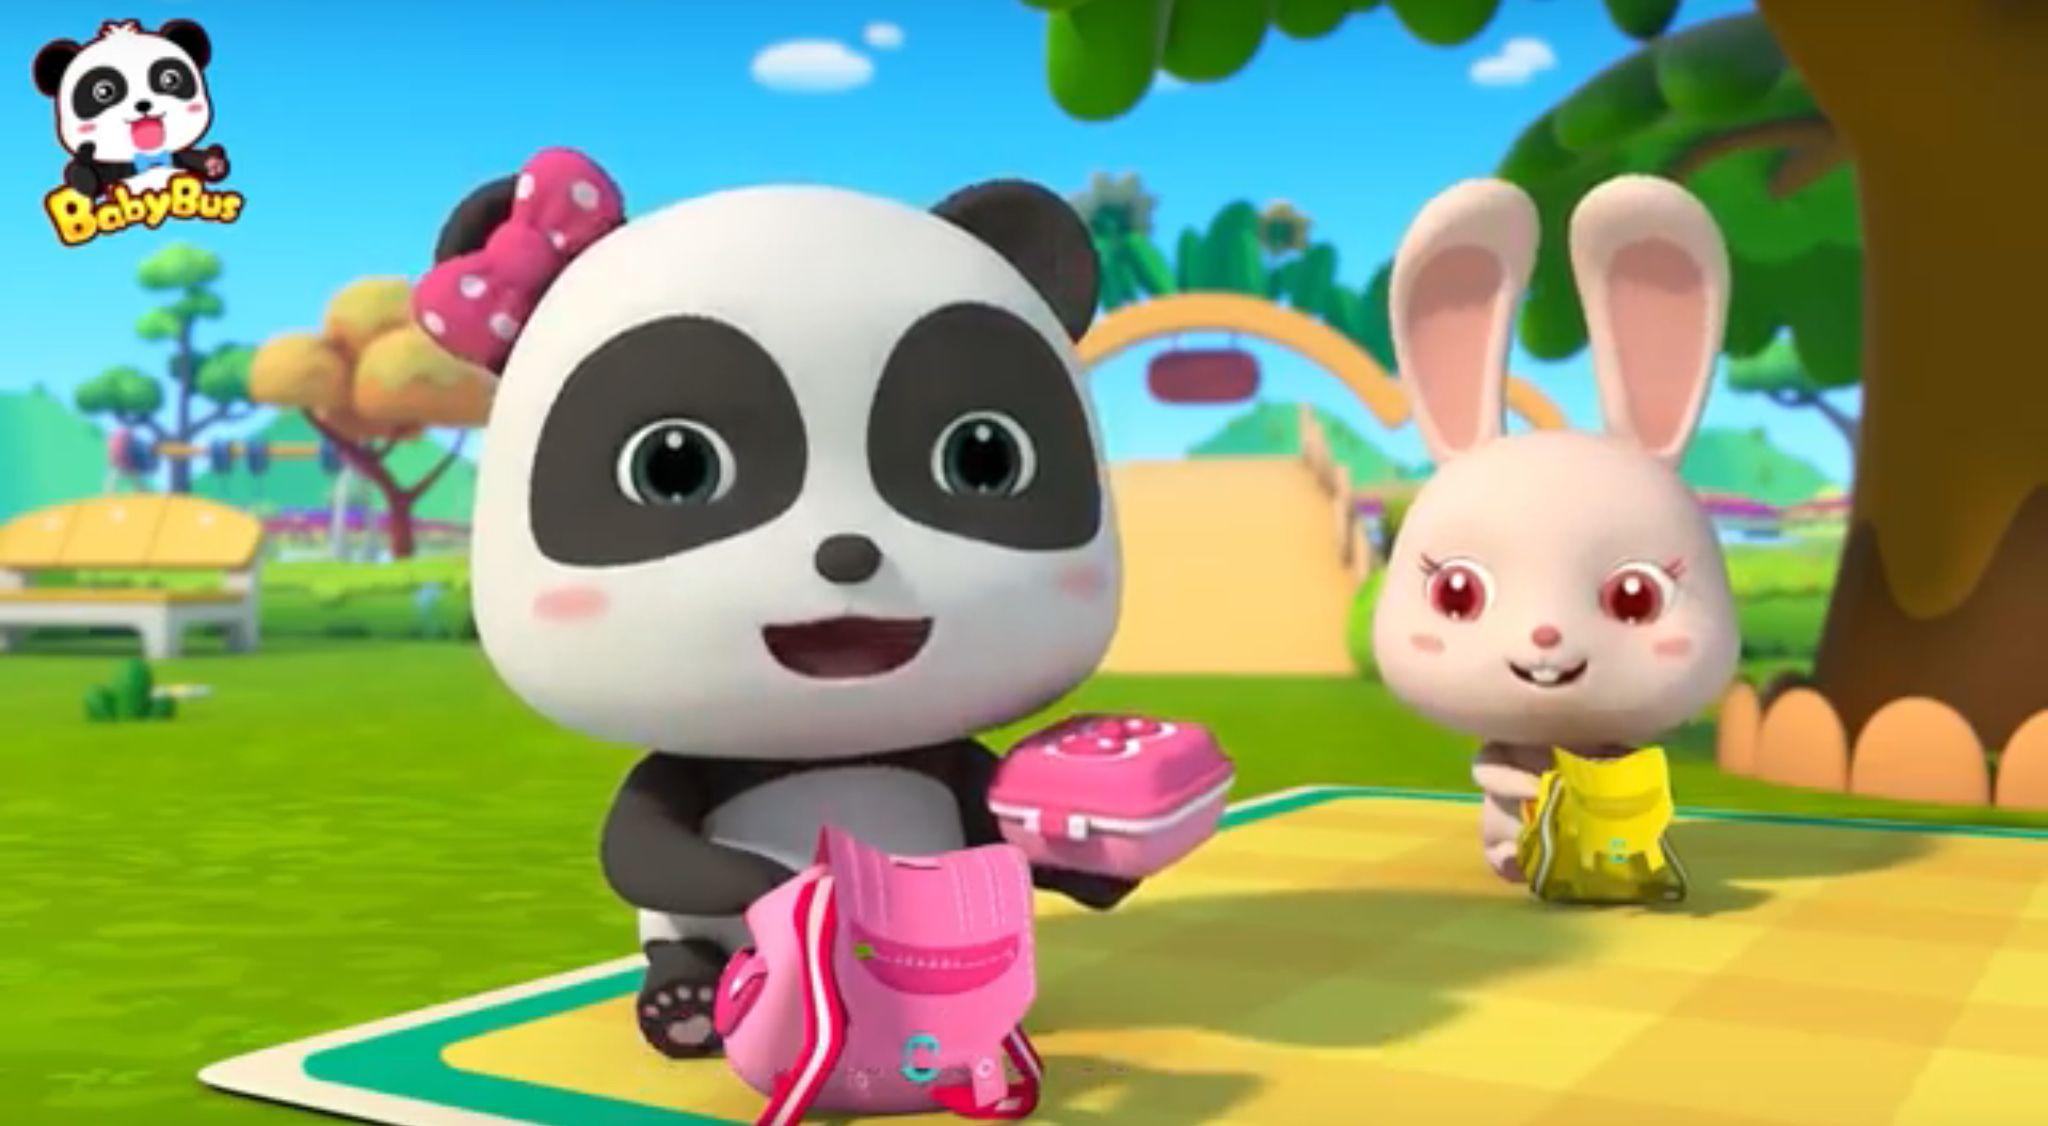 Pin By Narine Mardirossian On Babybus Kids Songs Baby Panda Songs For Toddlers